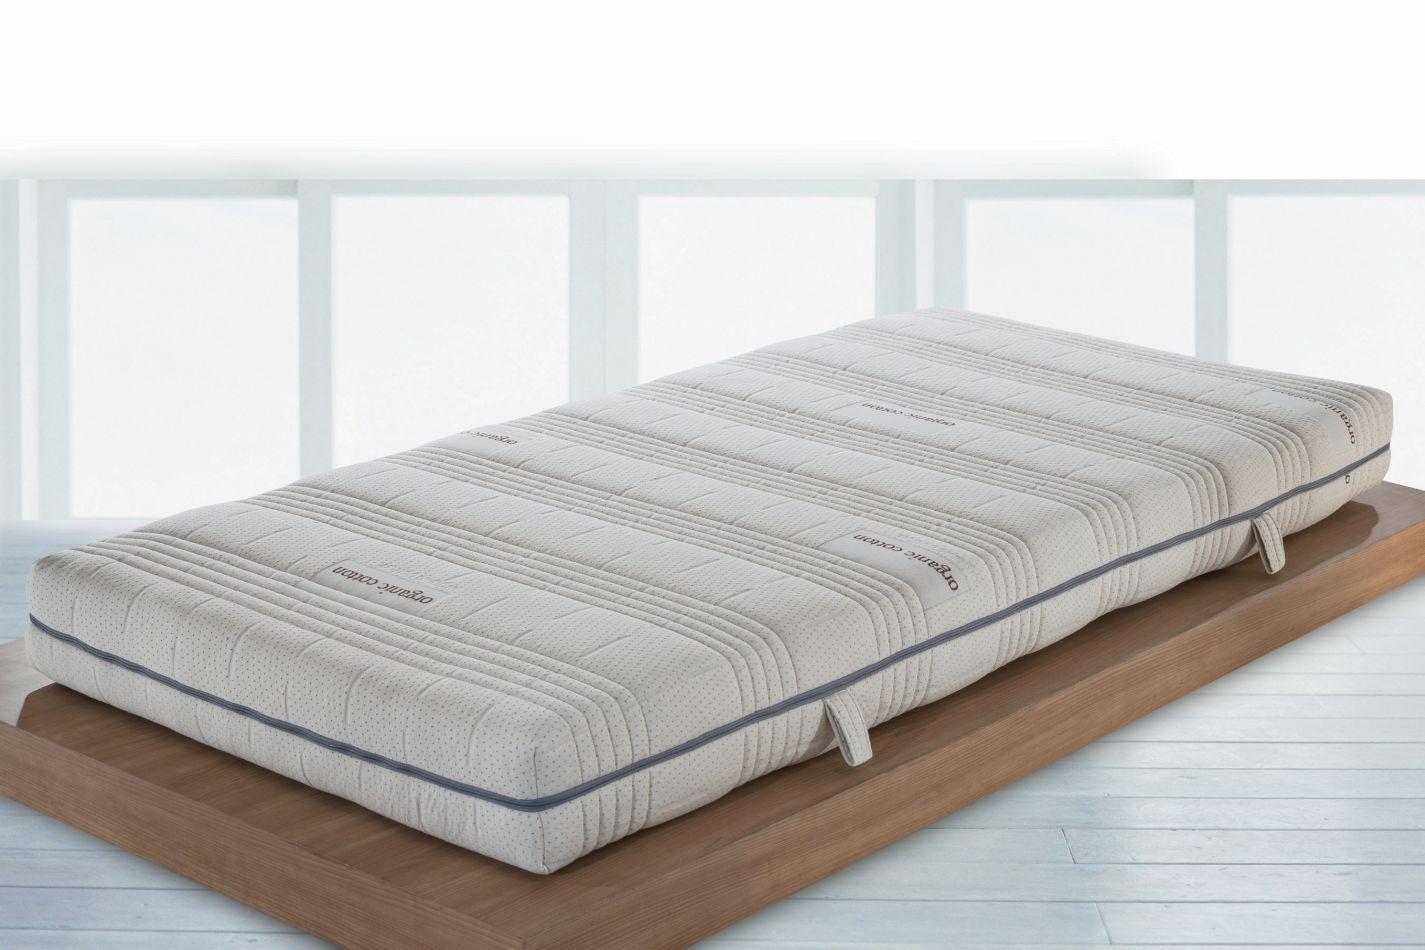 Matratze Latex - Abmessung: 90 x 190 cm